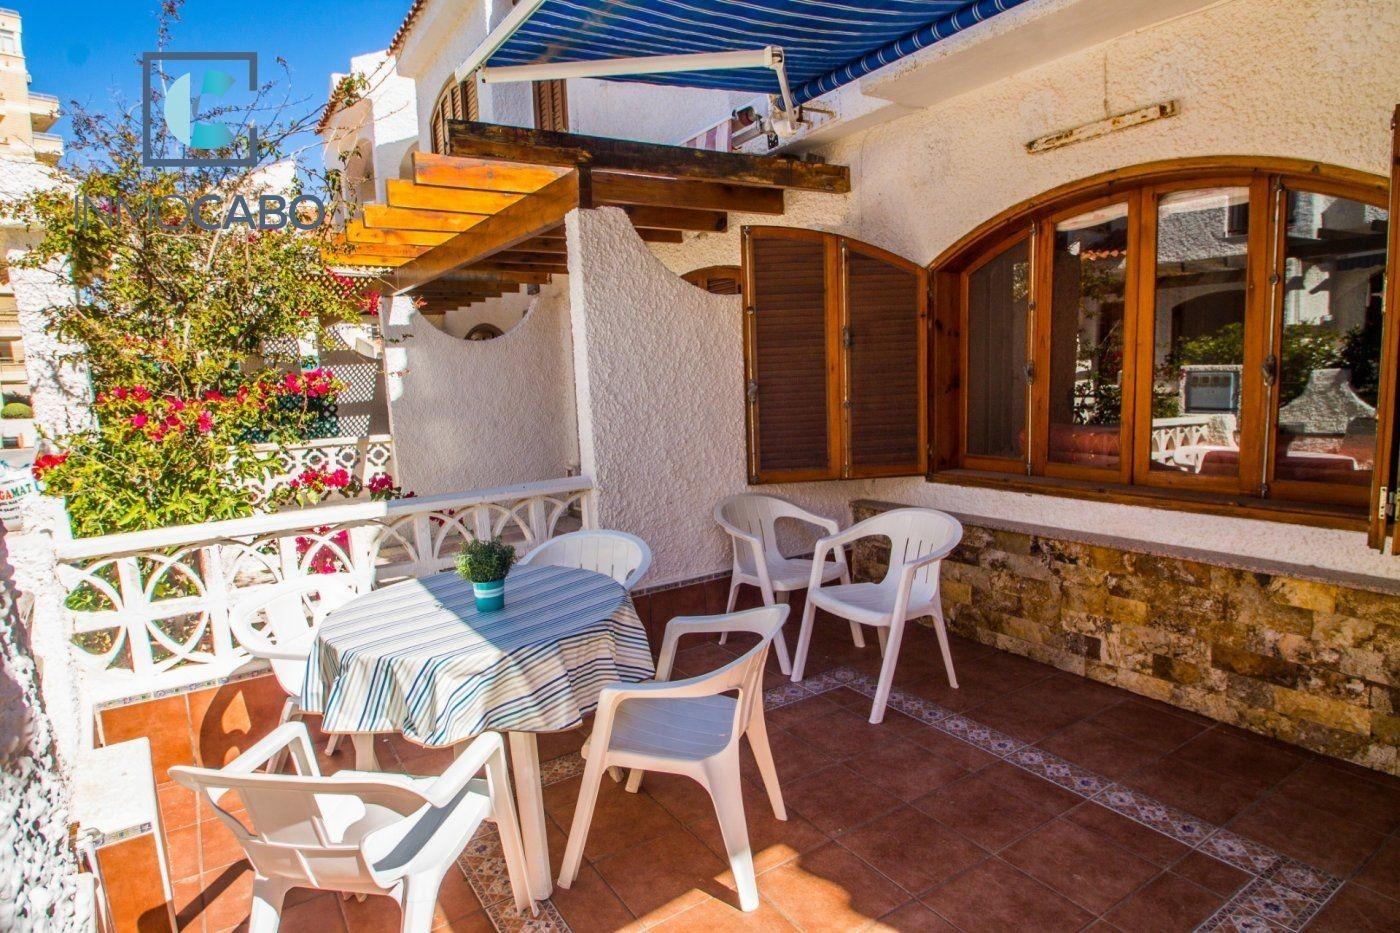 Townhouse for sale in EL GALAN, La Manga del Mar Menor